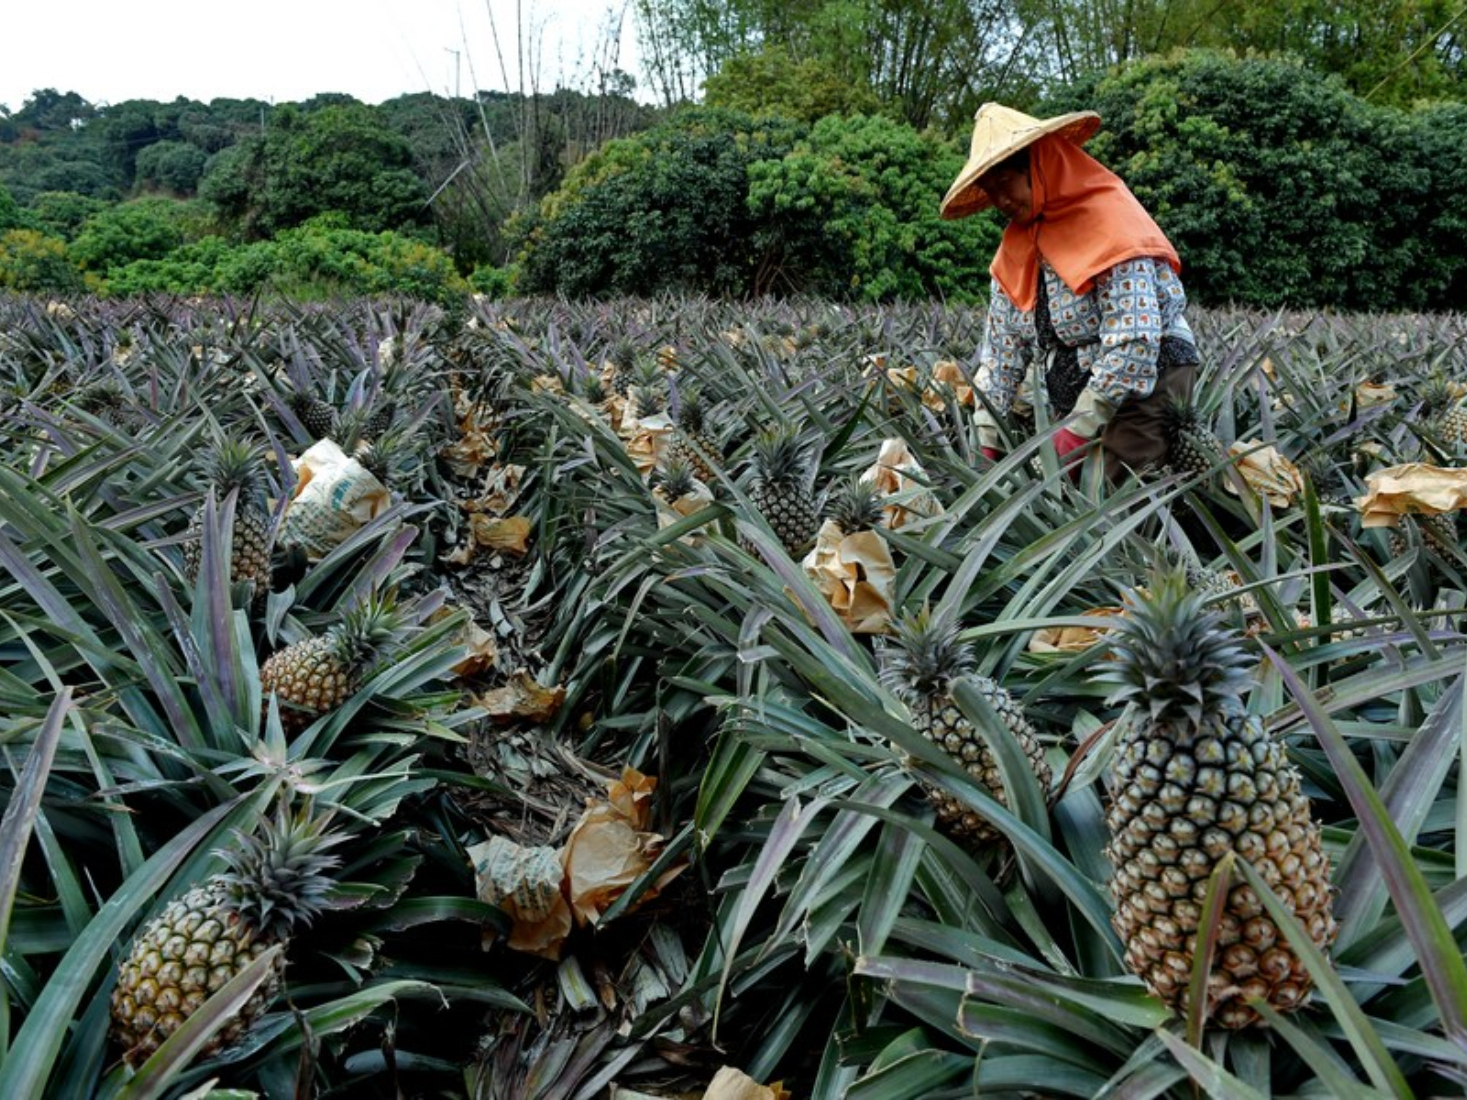 No feedback from Taiwan on substandard pineapple: mainland spokesperson